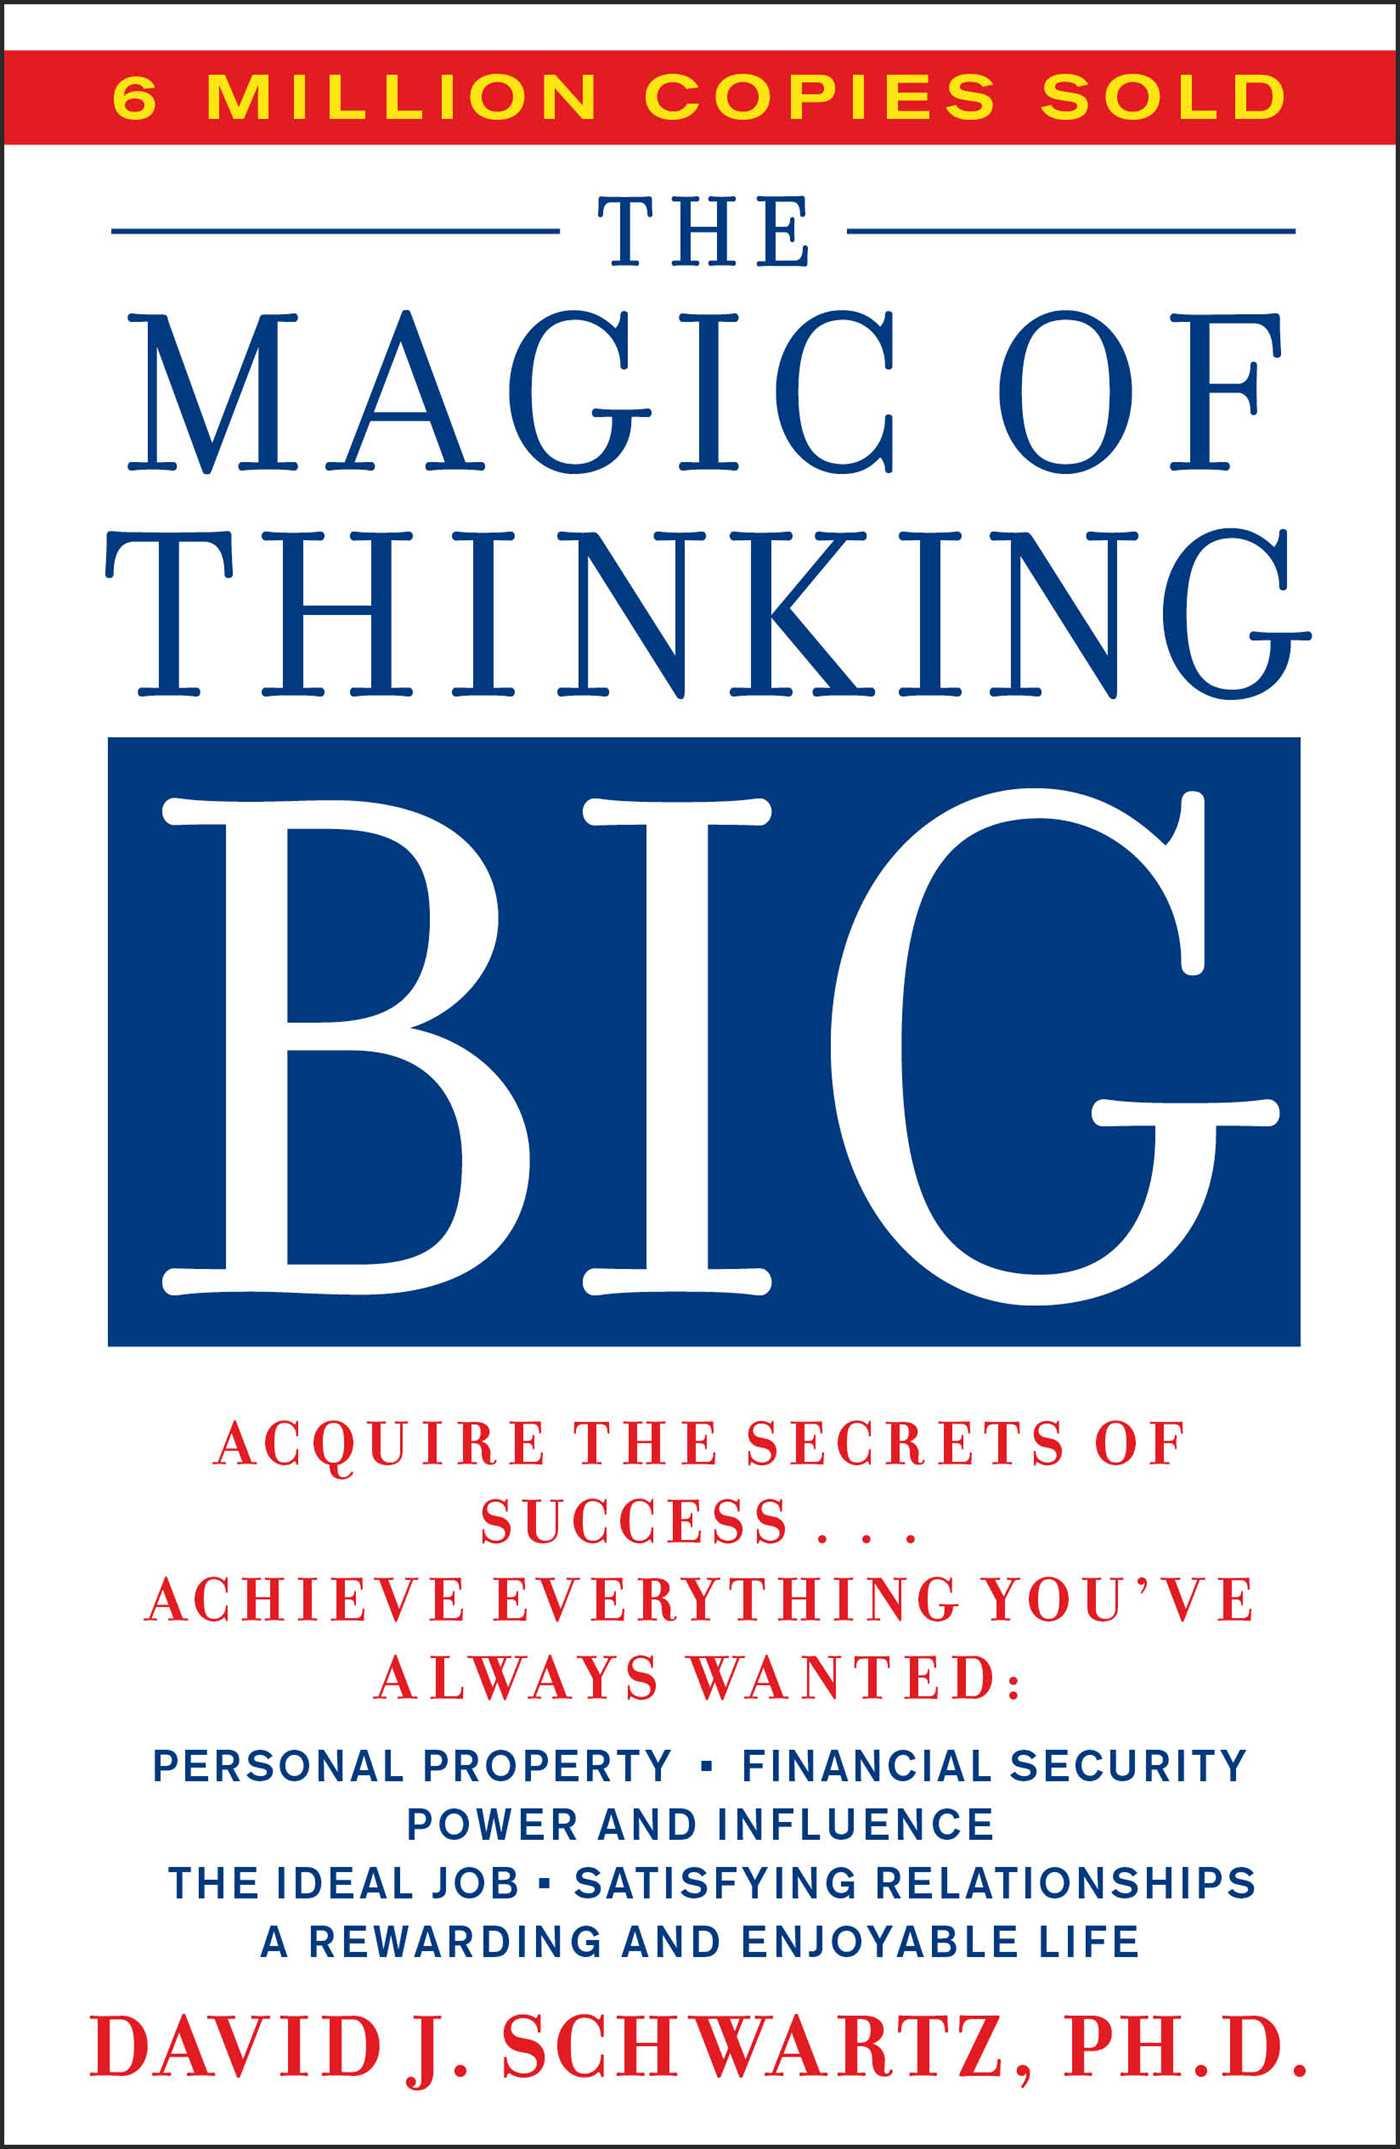 Magic of thinking big 9780671646783 hr